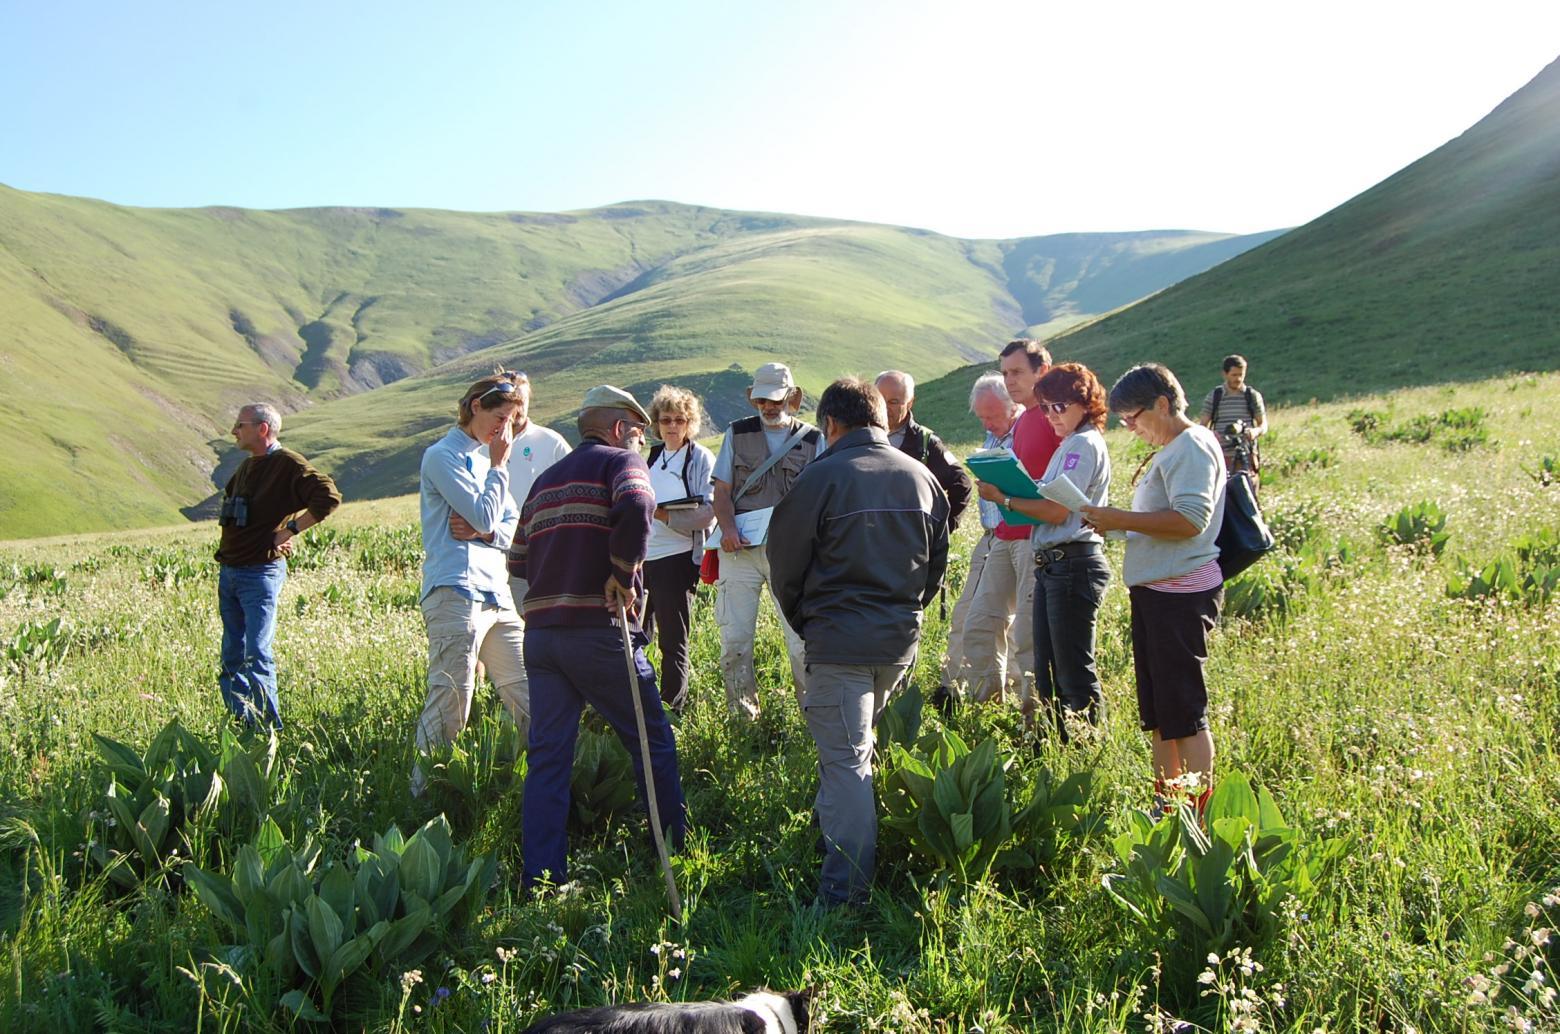 concours prairies fleuries en 2010 Haute-Romanche